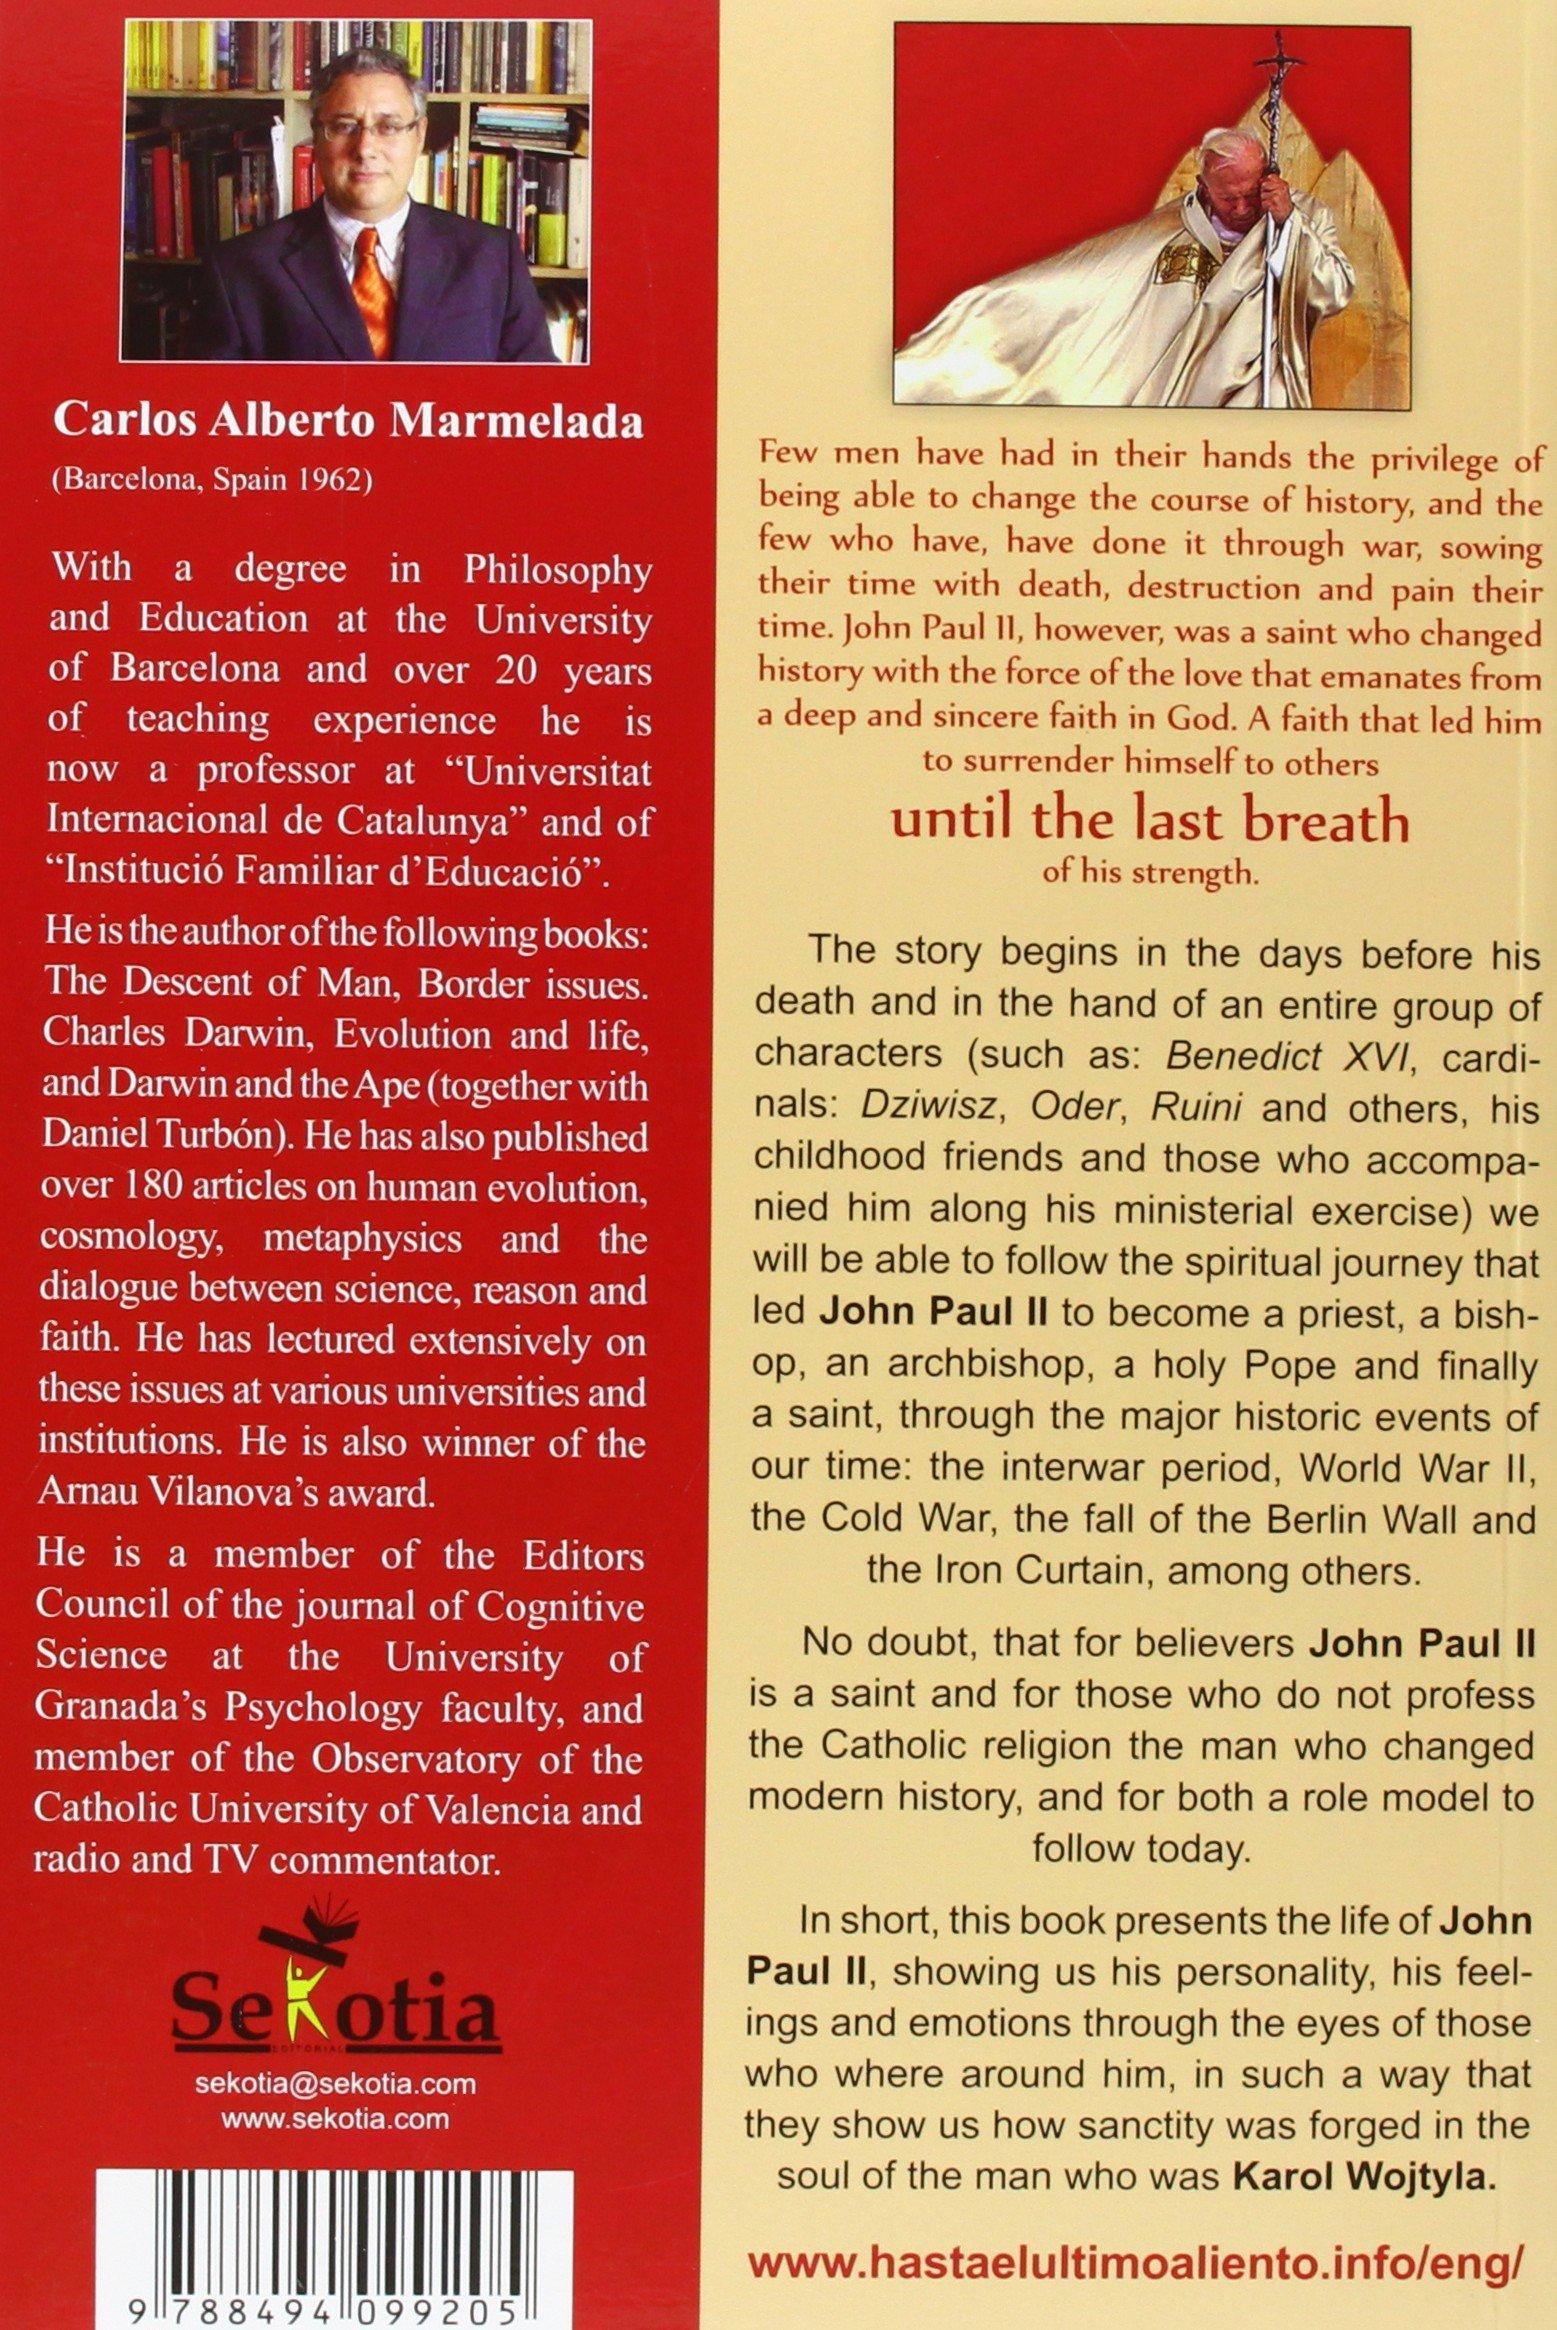 Until the Last Breath: John Paul II, the saint who changed history (Inglés) Tapa blanda – 4 jul 2018 Carlos Alberto Marmelada X Martín Fernández Cudré Sekotia S.L. 8494099205